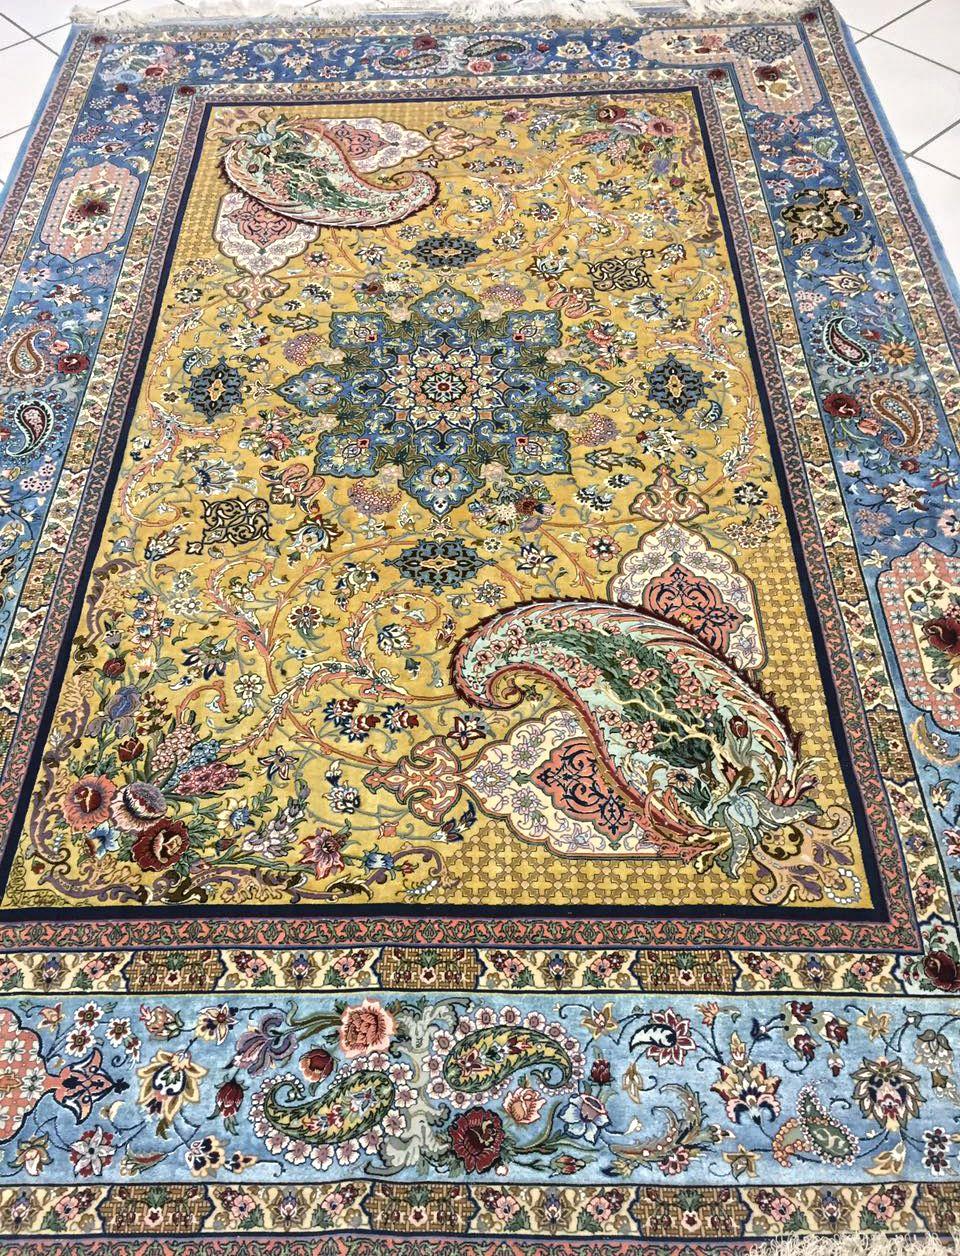 Grand Masterpiece By Ibrahimpour Pair Silk Persian Rug Item Cs Hf 2009 Silk Persian Rugs Rugs Rugs On Carpet